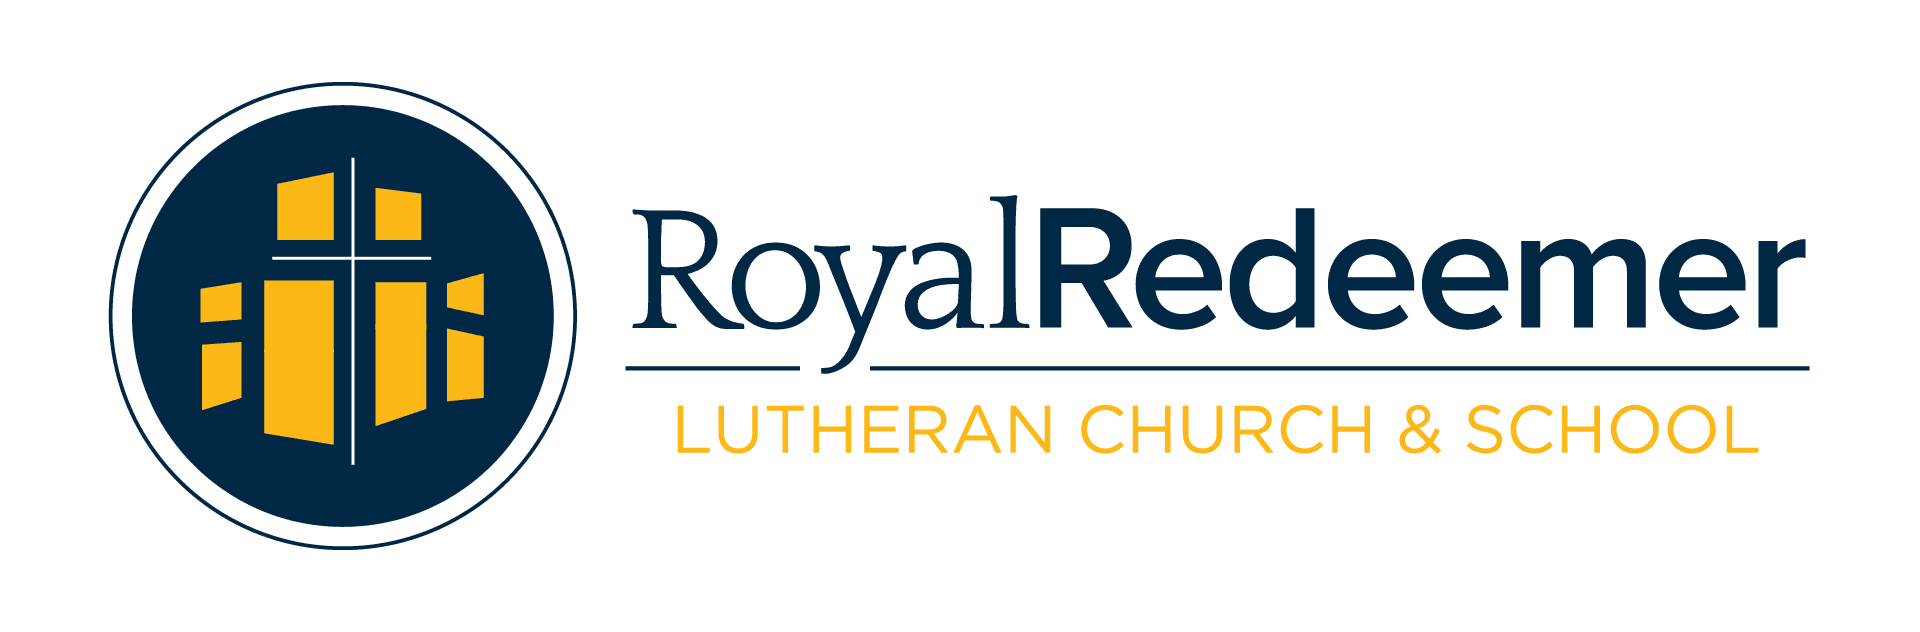 Royal Redeemer - Food Pantry